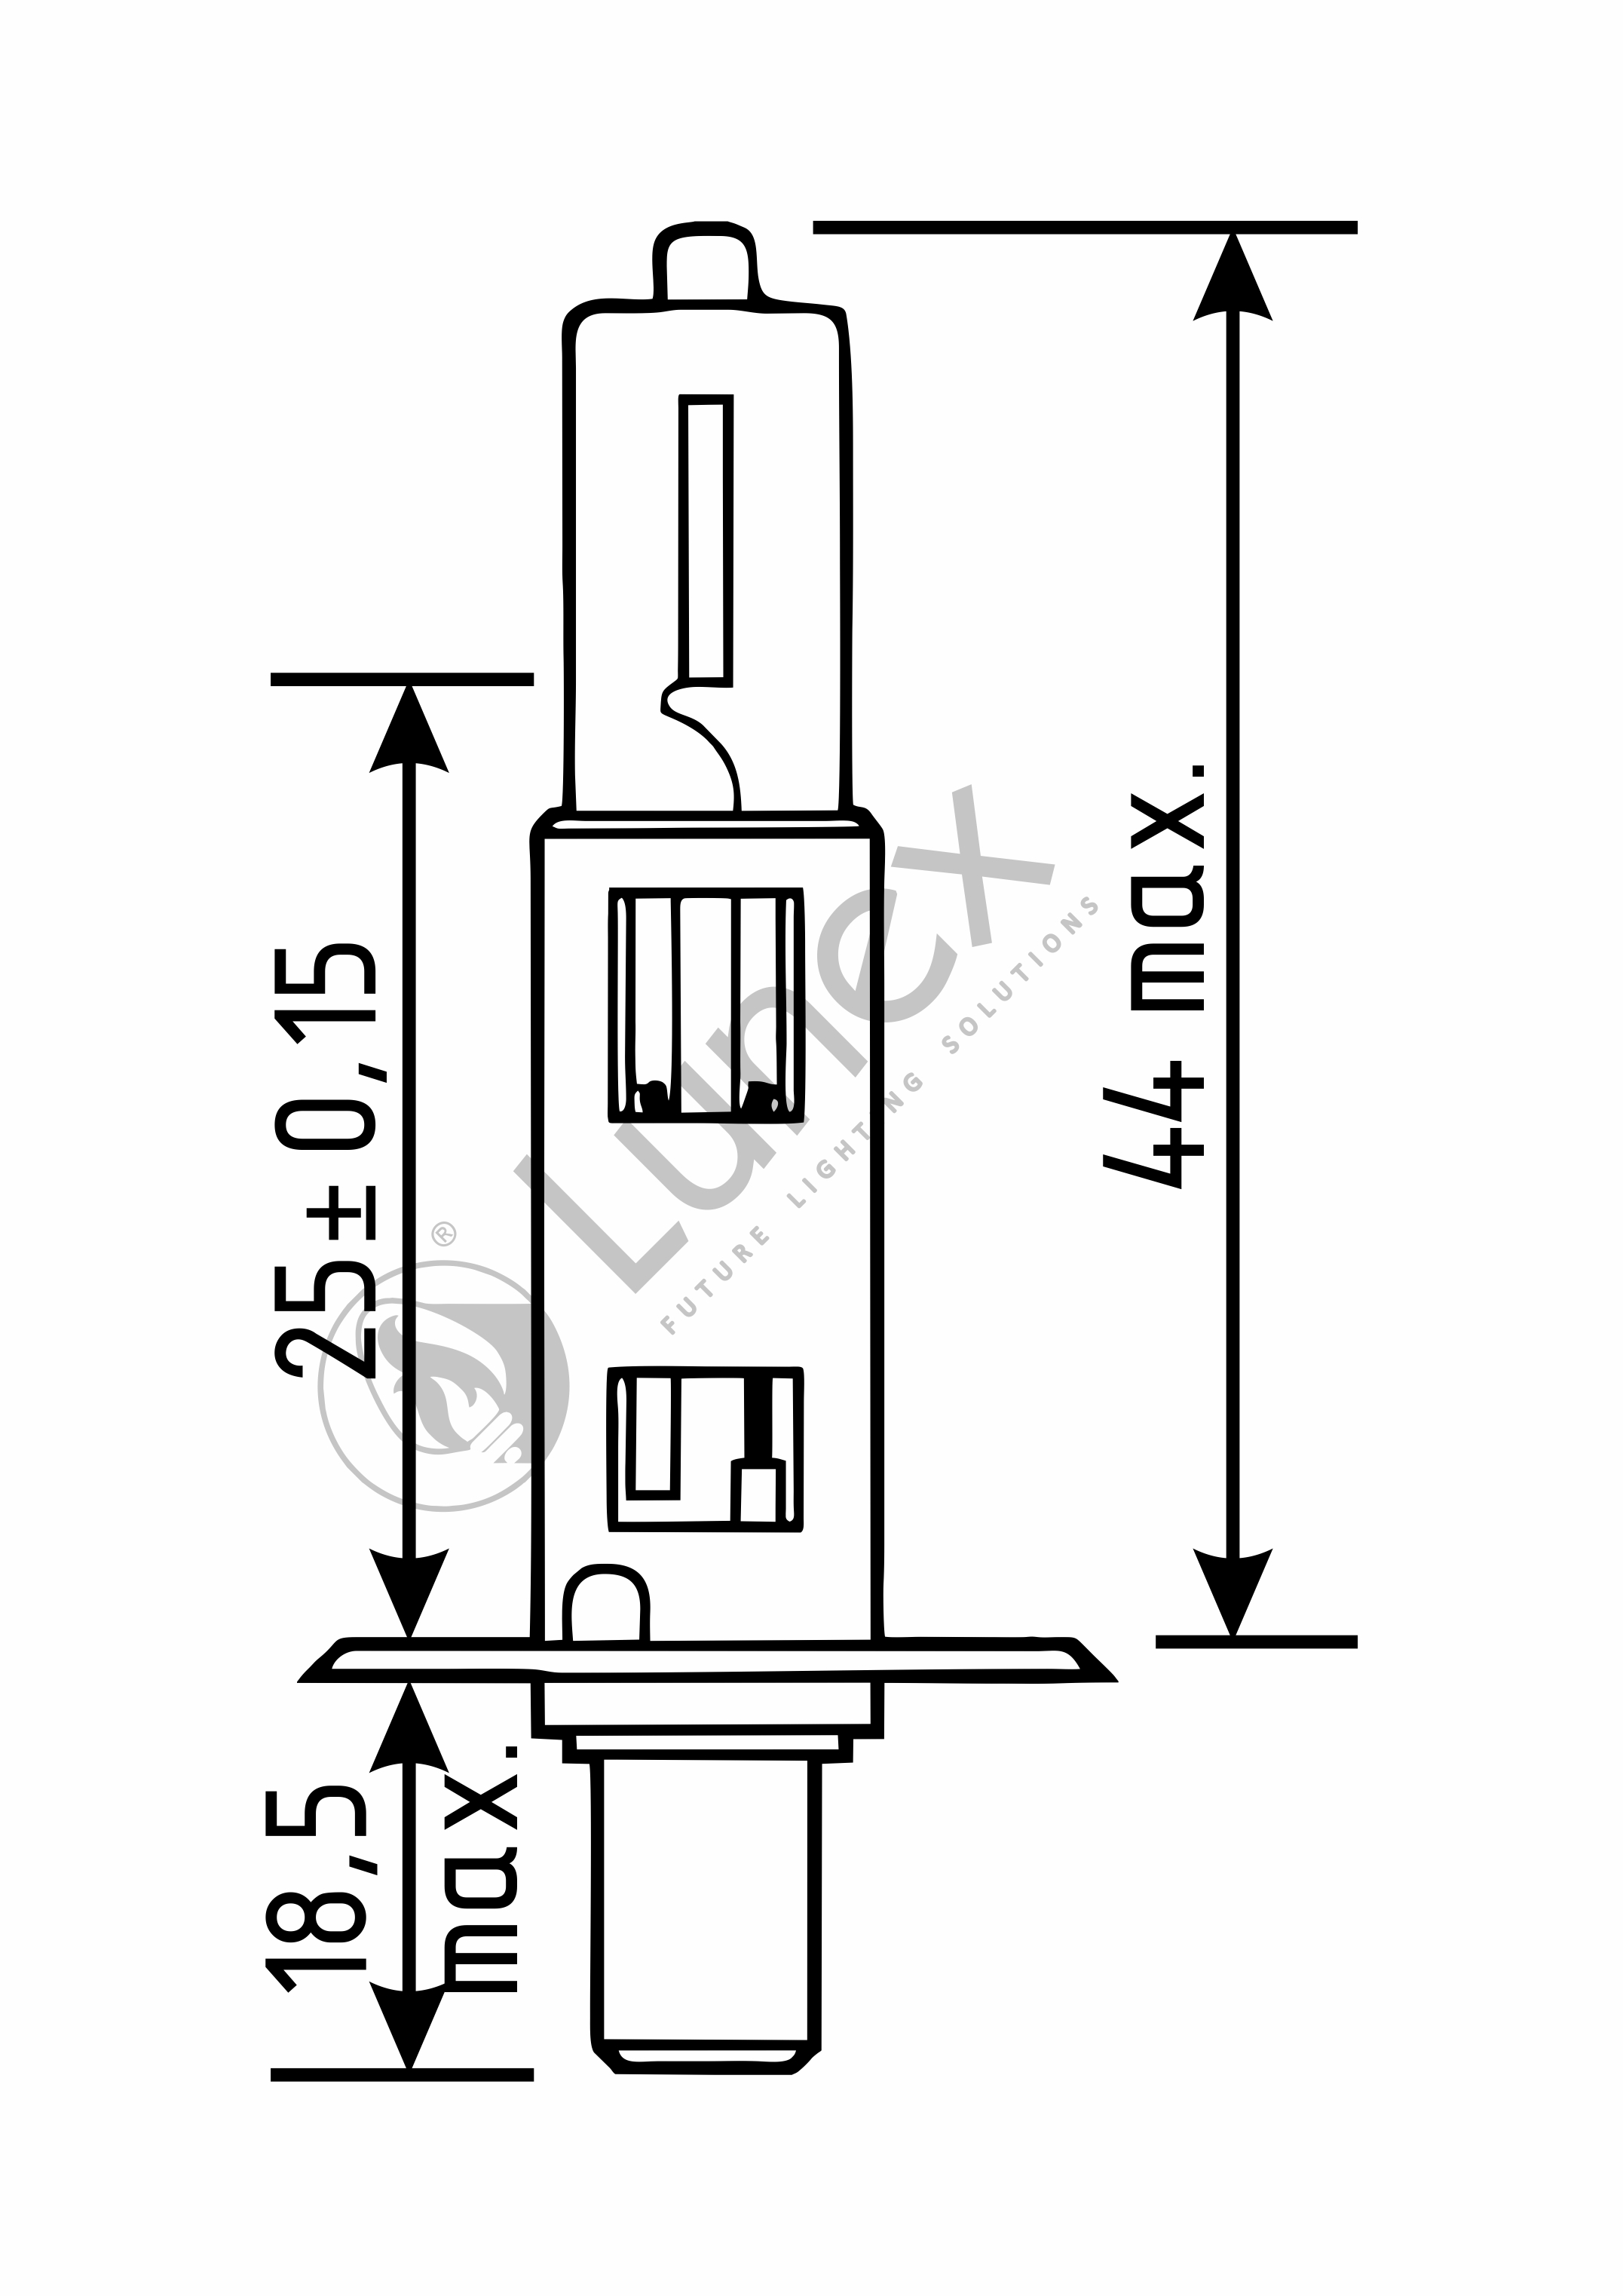 08G139 ALTERNATOR Regulator Mercedes SL350 3.7 230 Vito Viano 3.2 3.7 639 23580